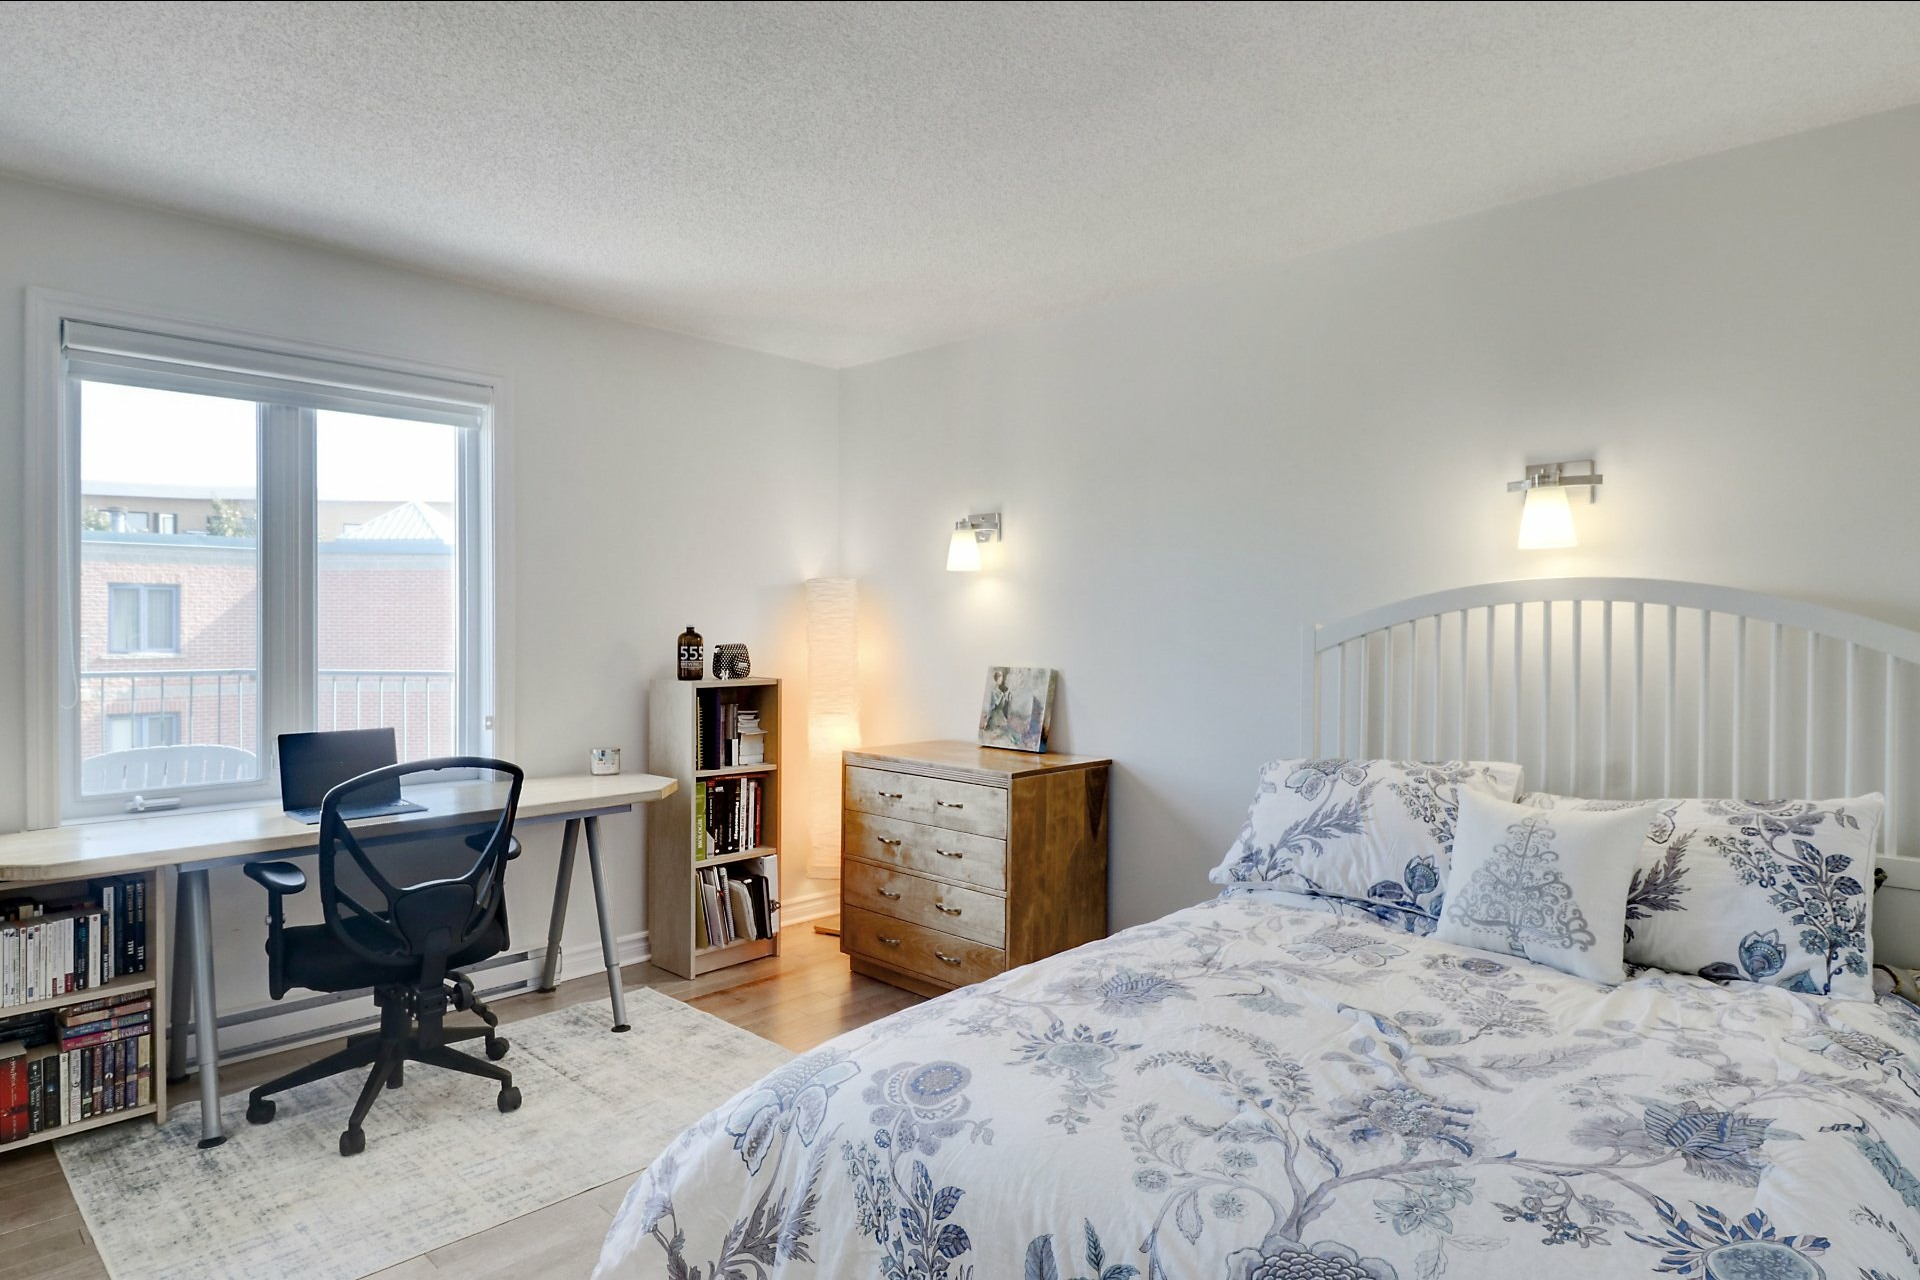 image 32 - Apartment For sale Beloeil - 9 rooms